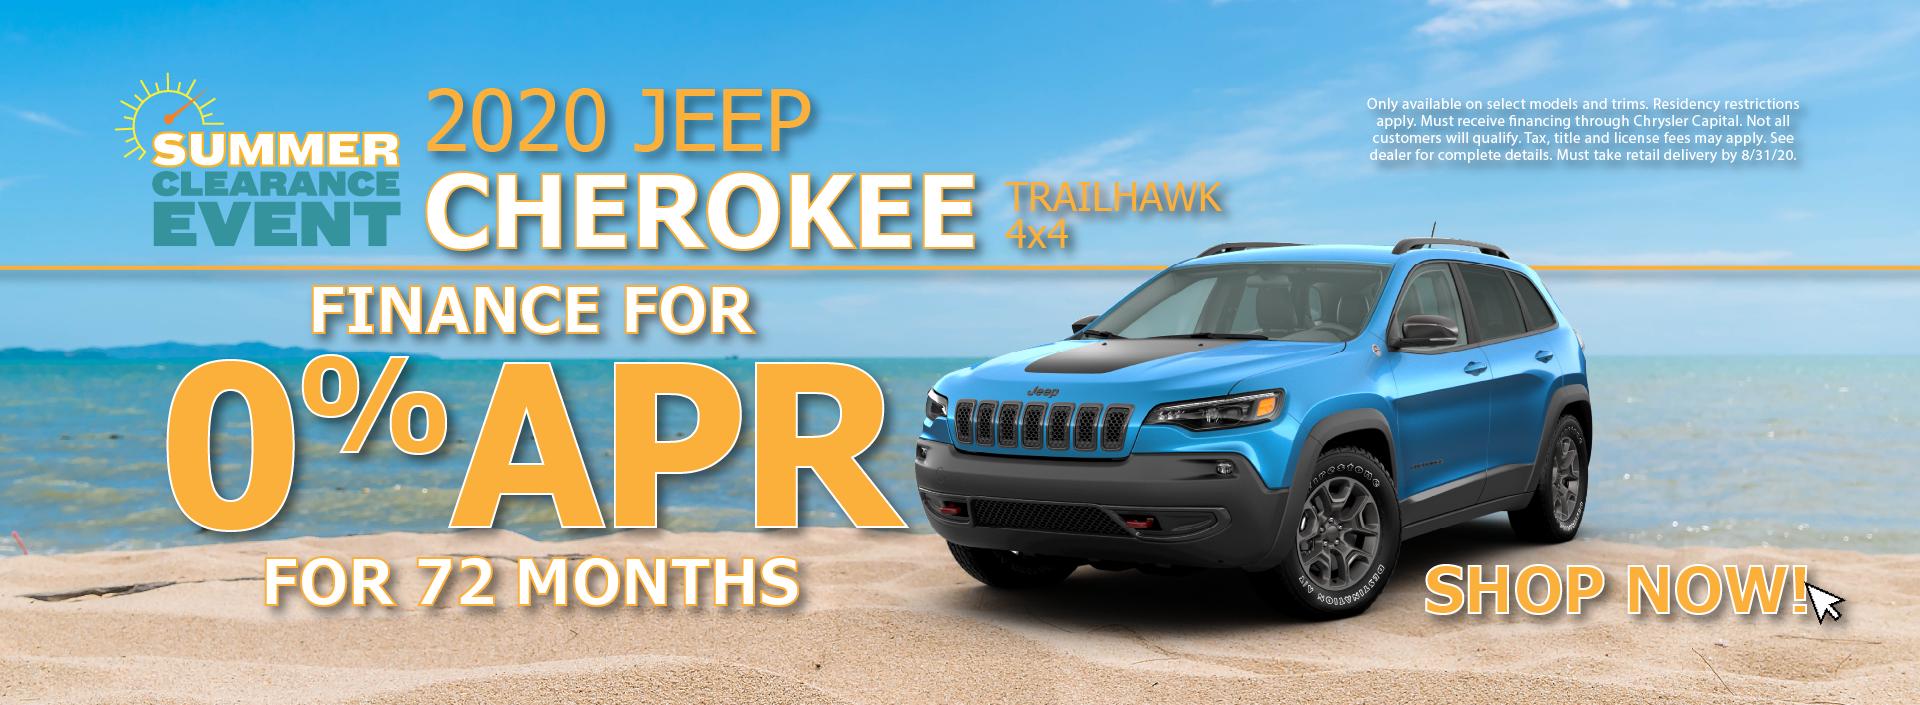 2020 Jeep Cherokee 0% APR